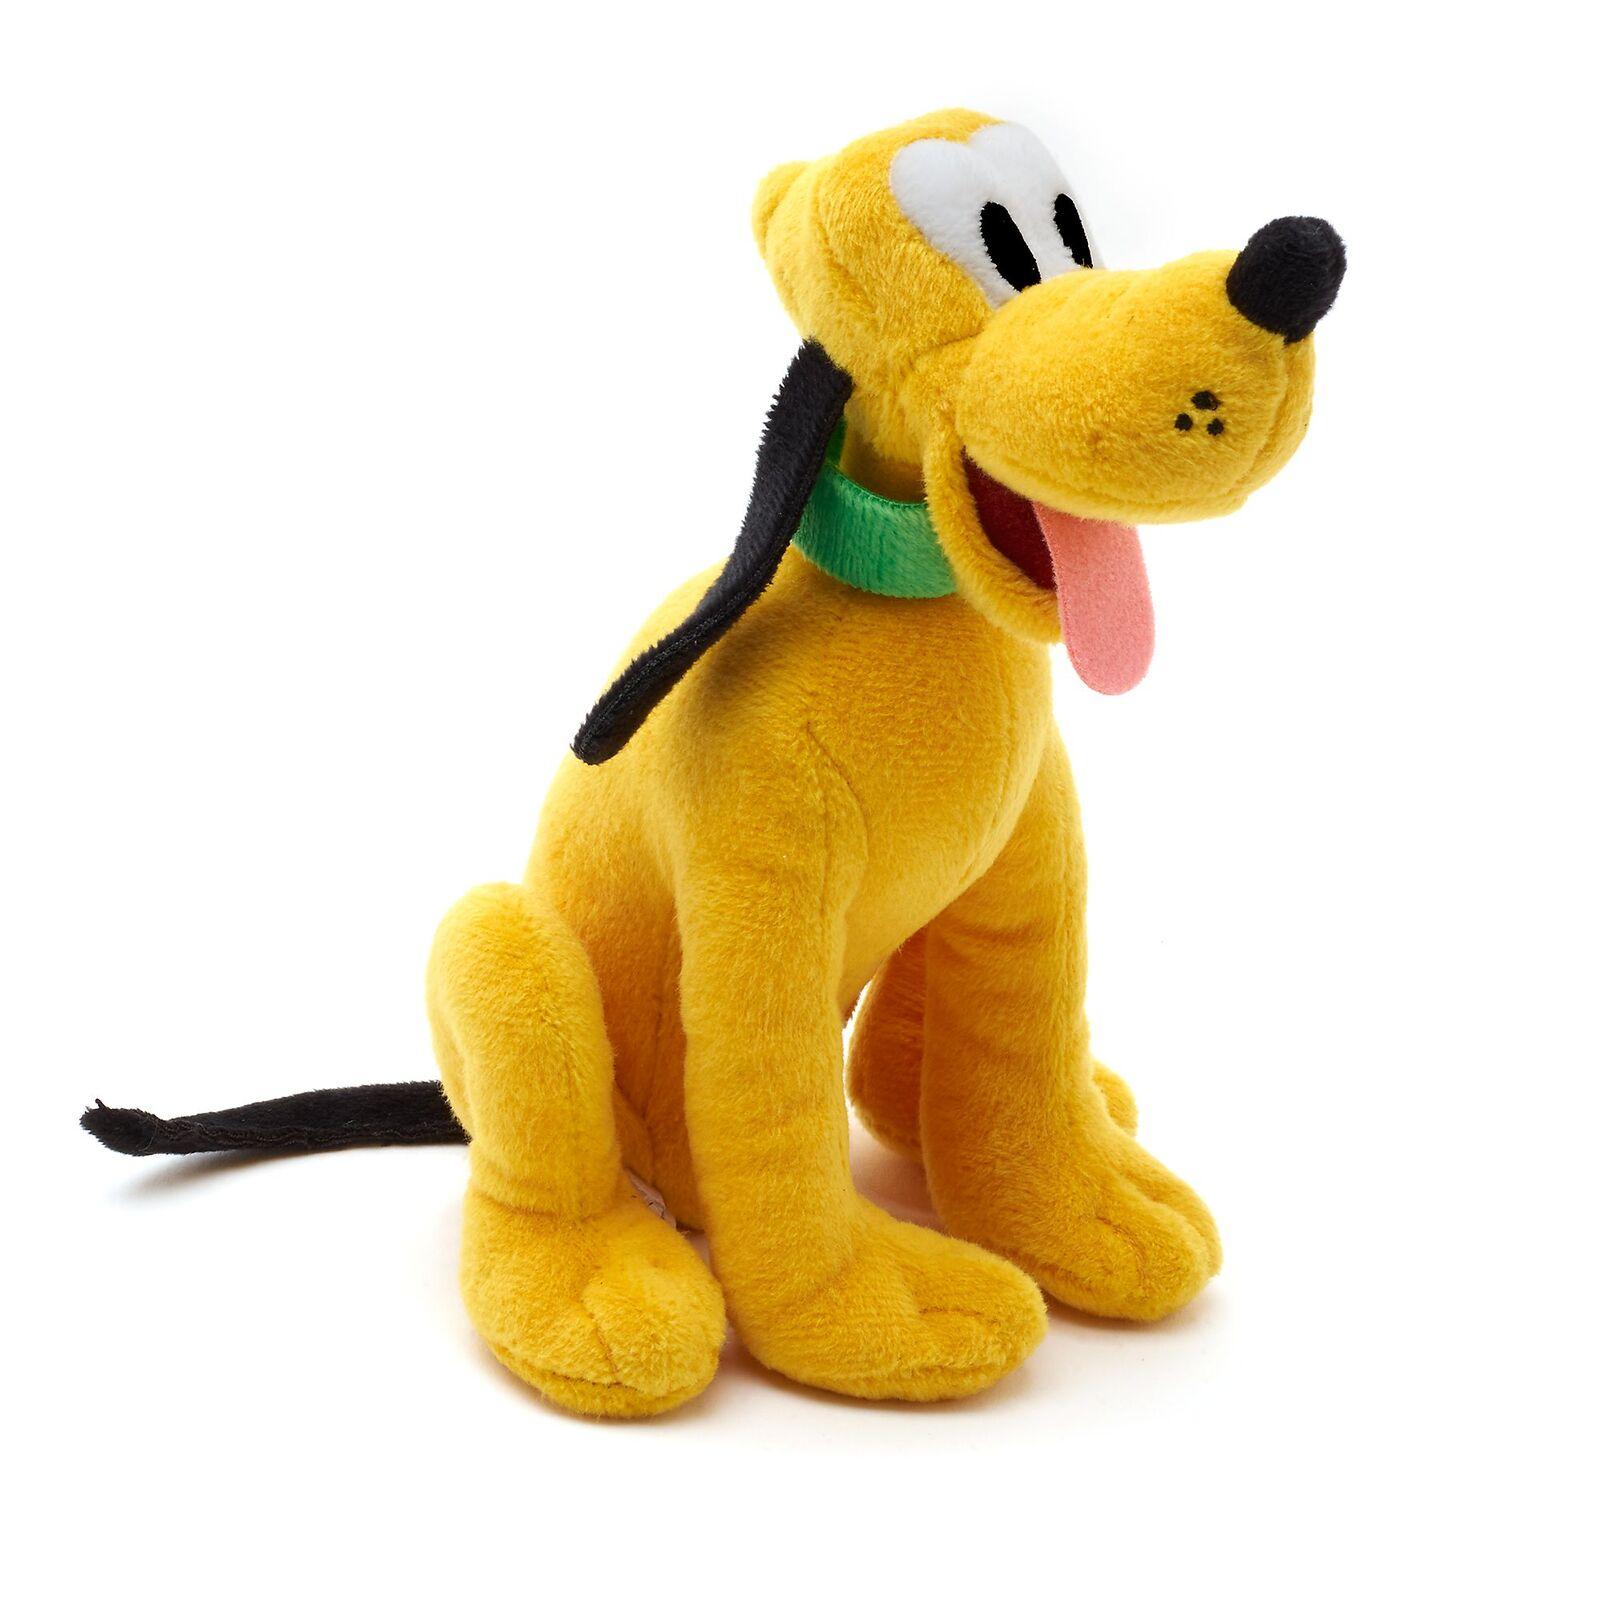 Pluto Plush Small - Disney